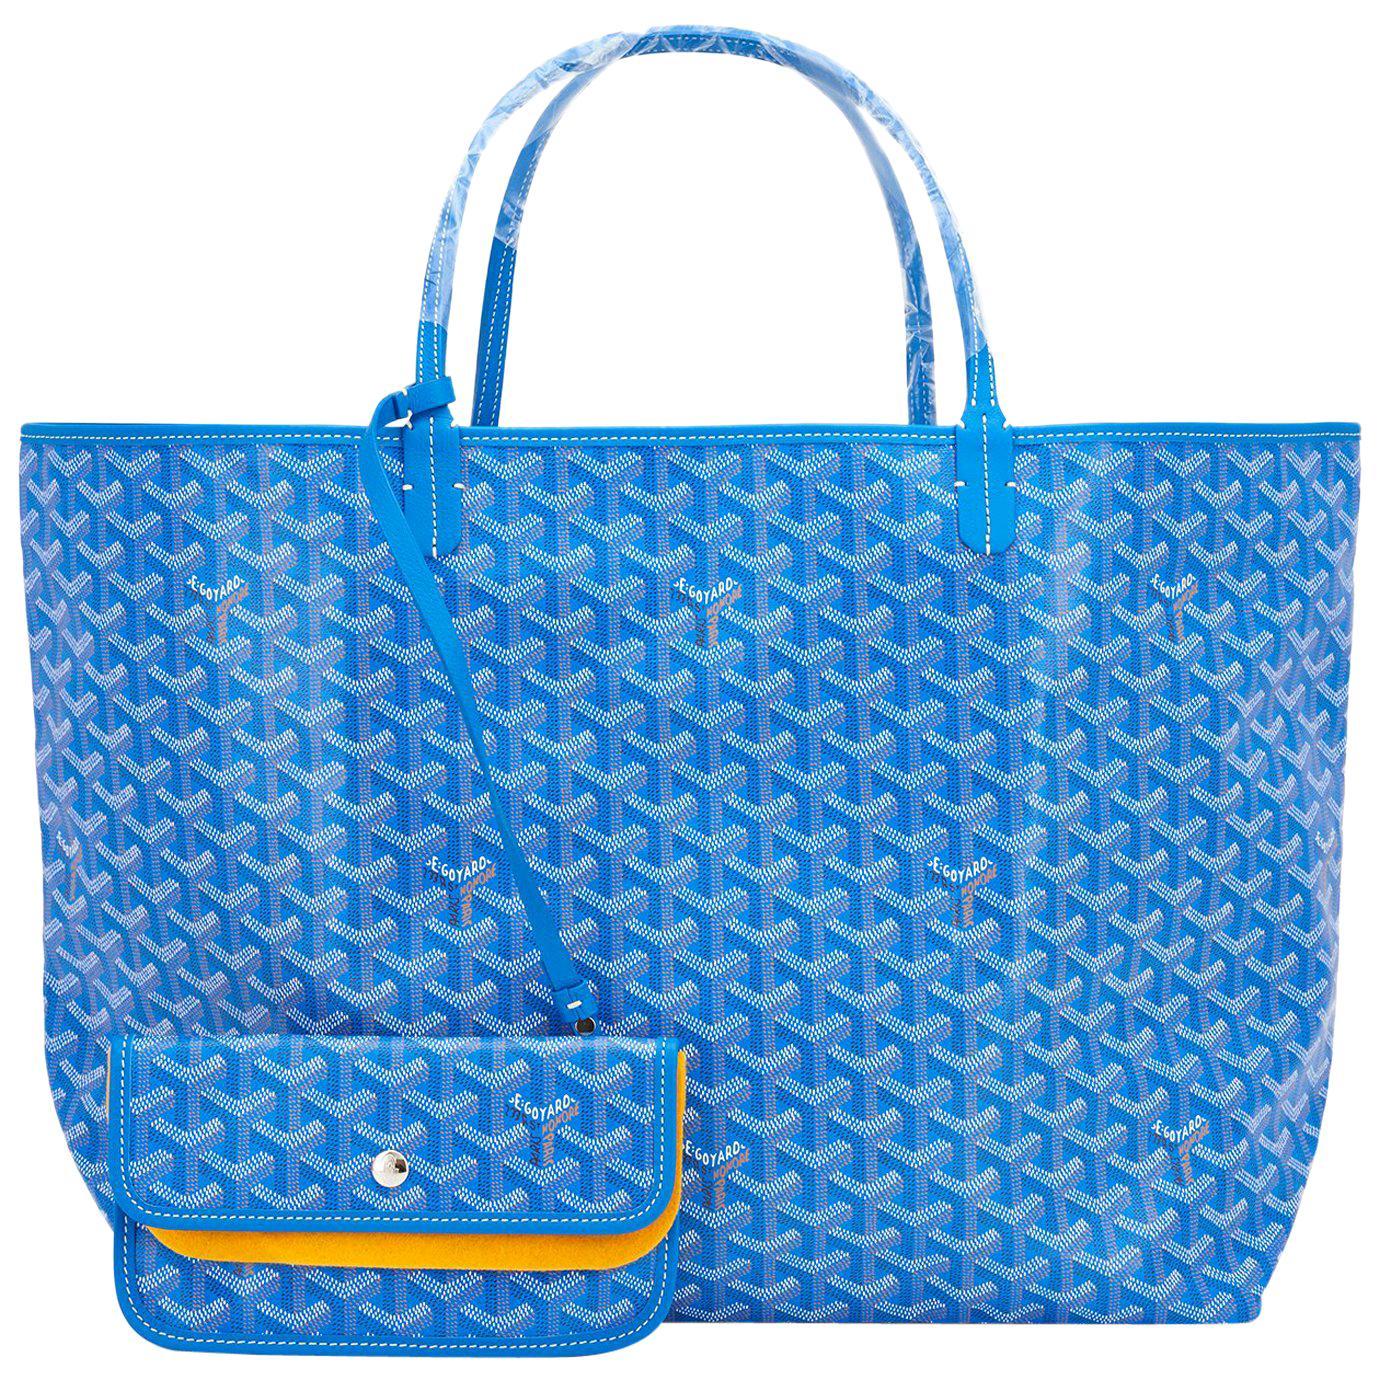 Goyard Blue Claire St Louis GM Chevron Tote Bag Celeb Favorite NEW, 2021